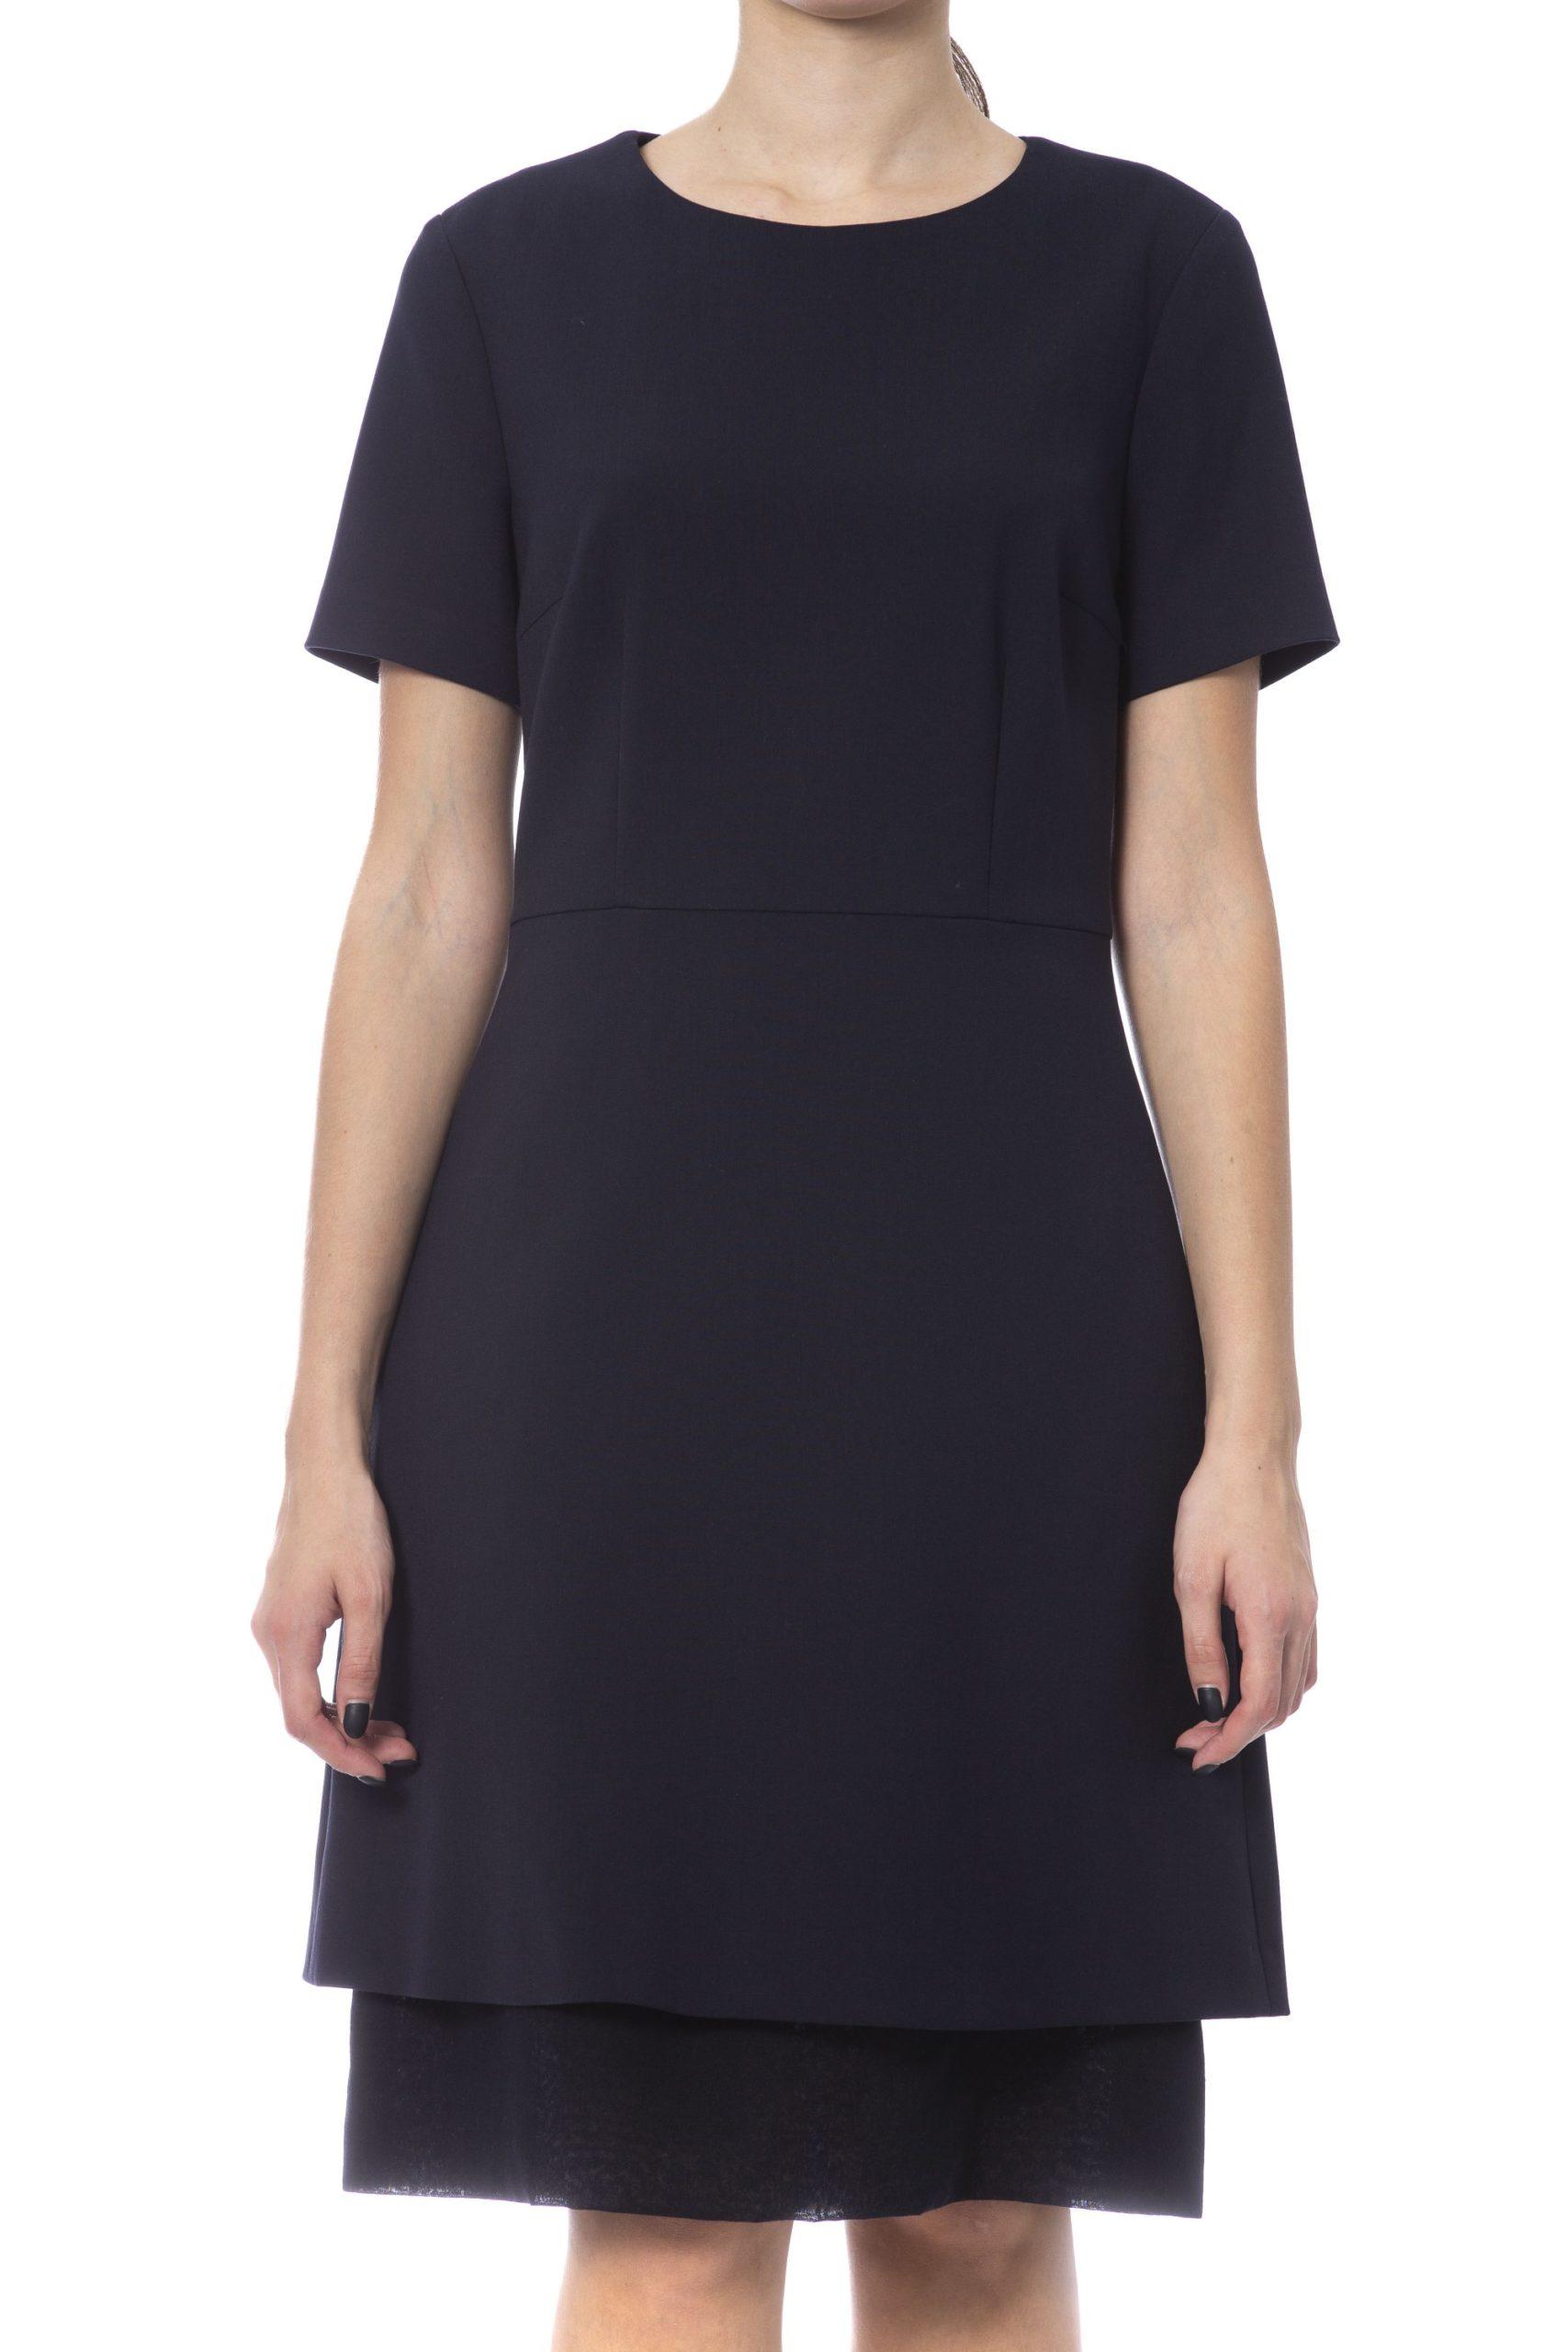 Peserico Women's Dress Blue PE992082 - IT42 | S